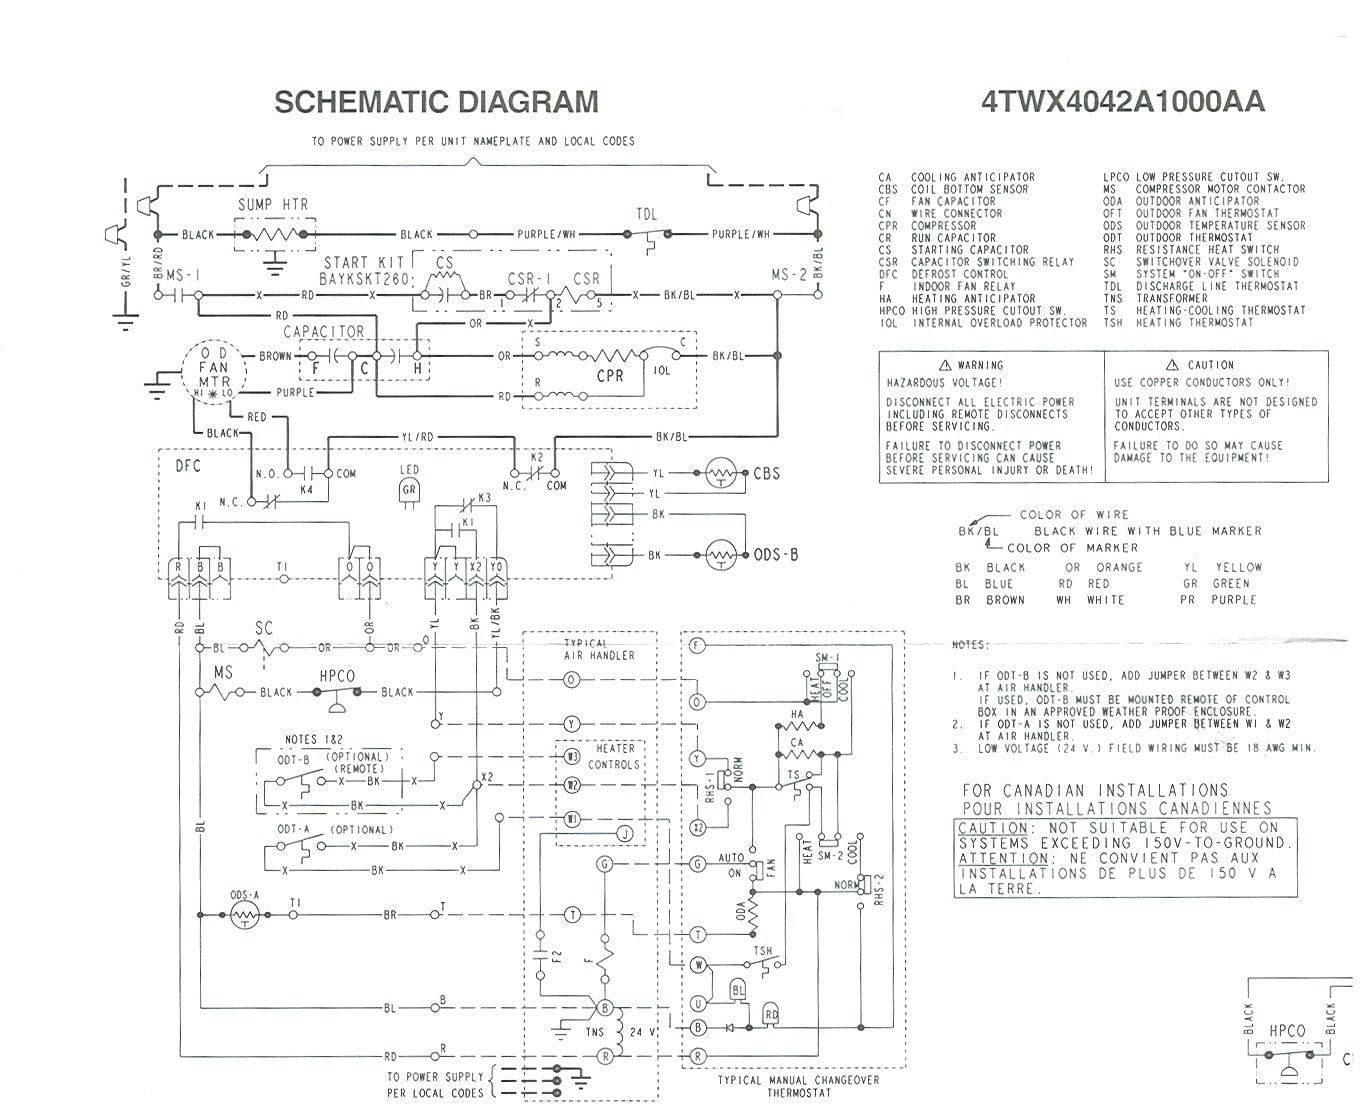 wiring diagram trane xl1400 auto wiring diagram today u2022 rh bigrecharge co Trane Model Number Nomenclature Trane Air Handler Wiring Diagrams